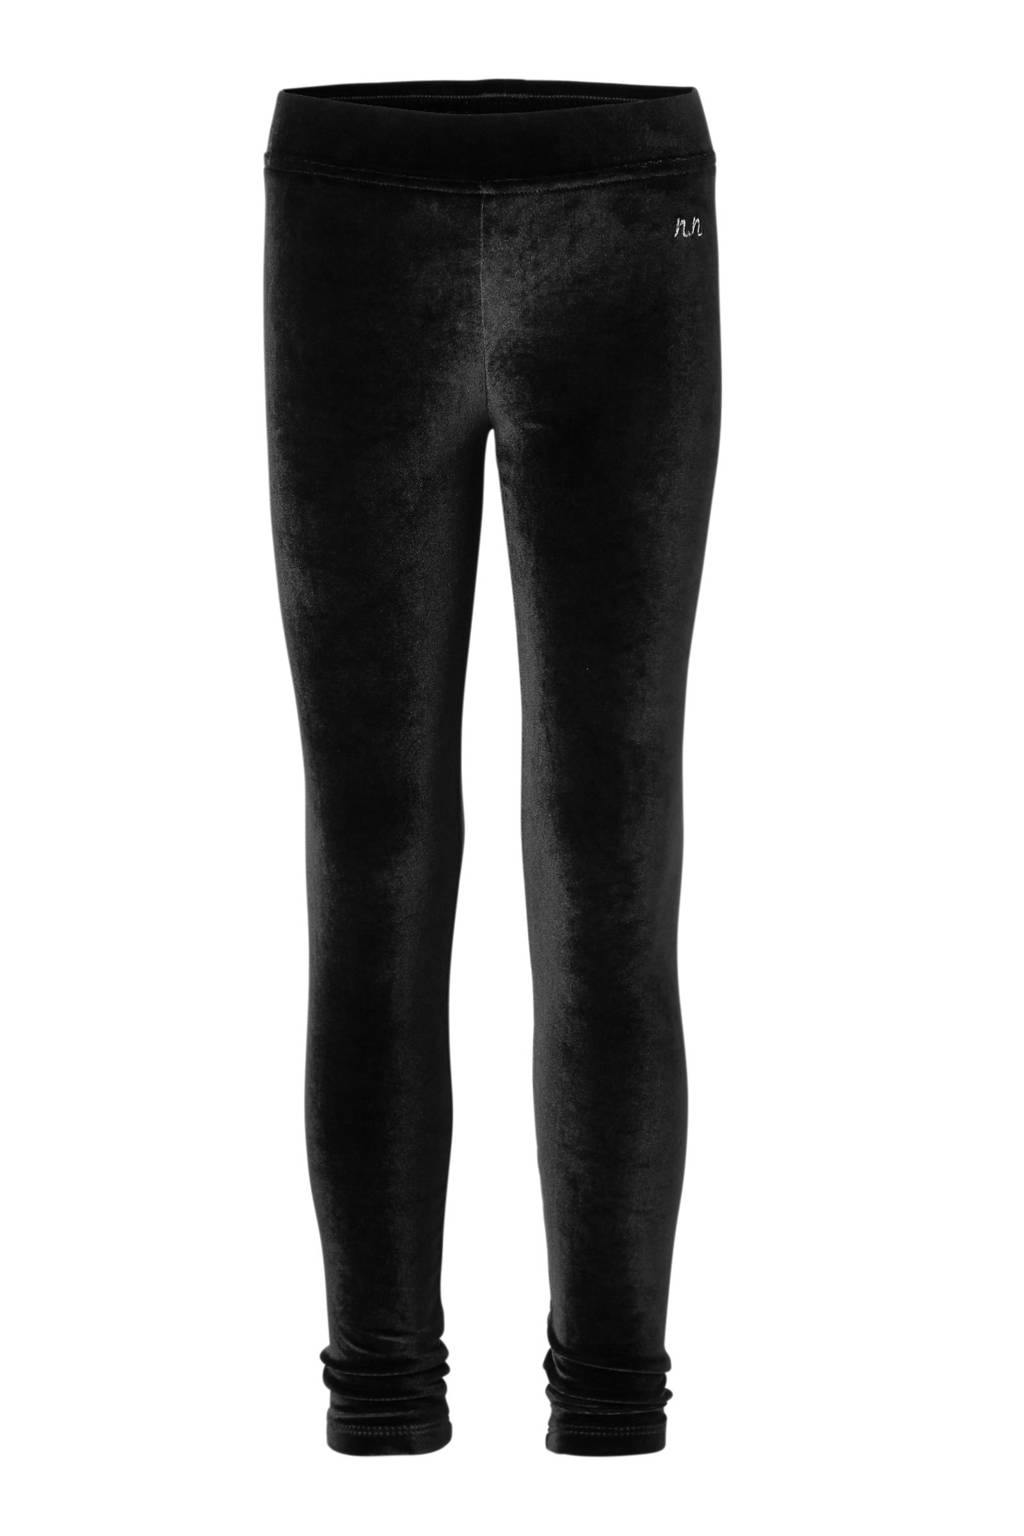 NIK&NIK fluwelen legging Faylinn zwart, Zwart